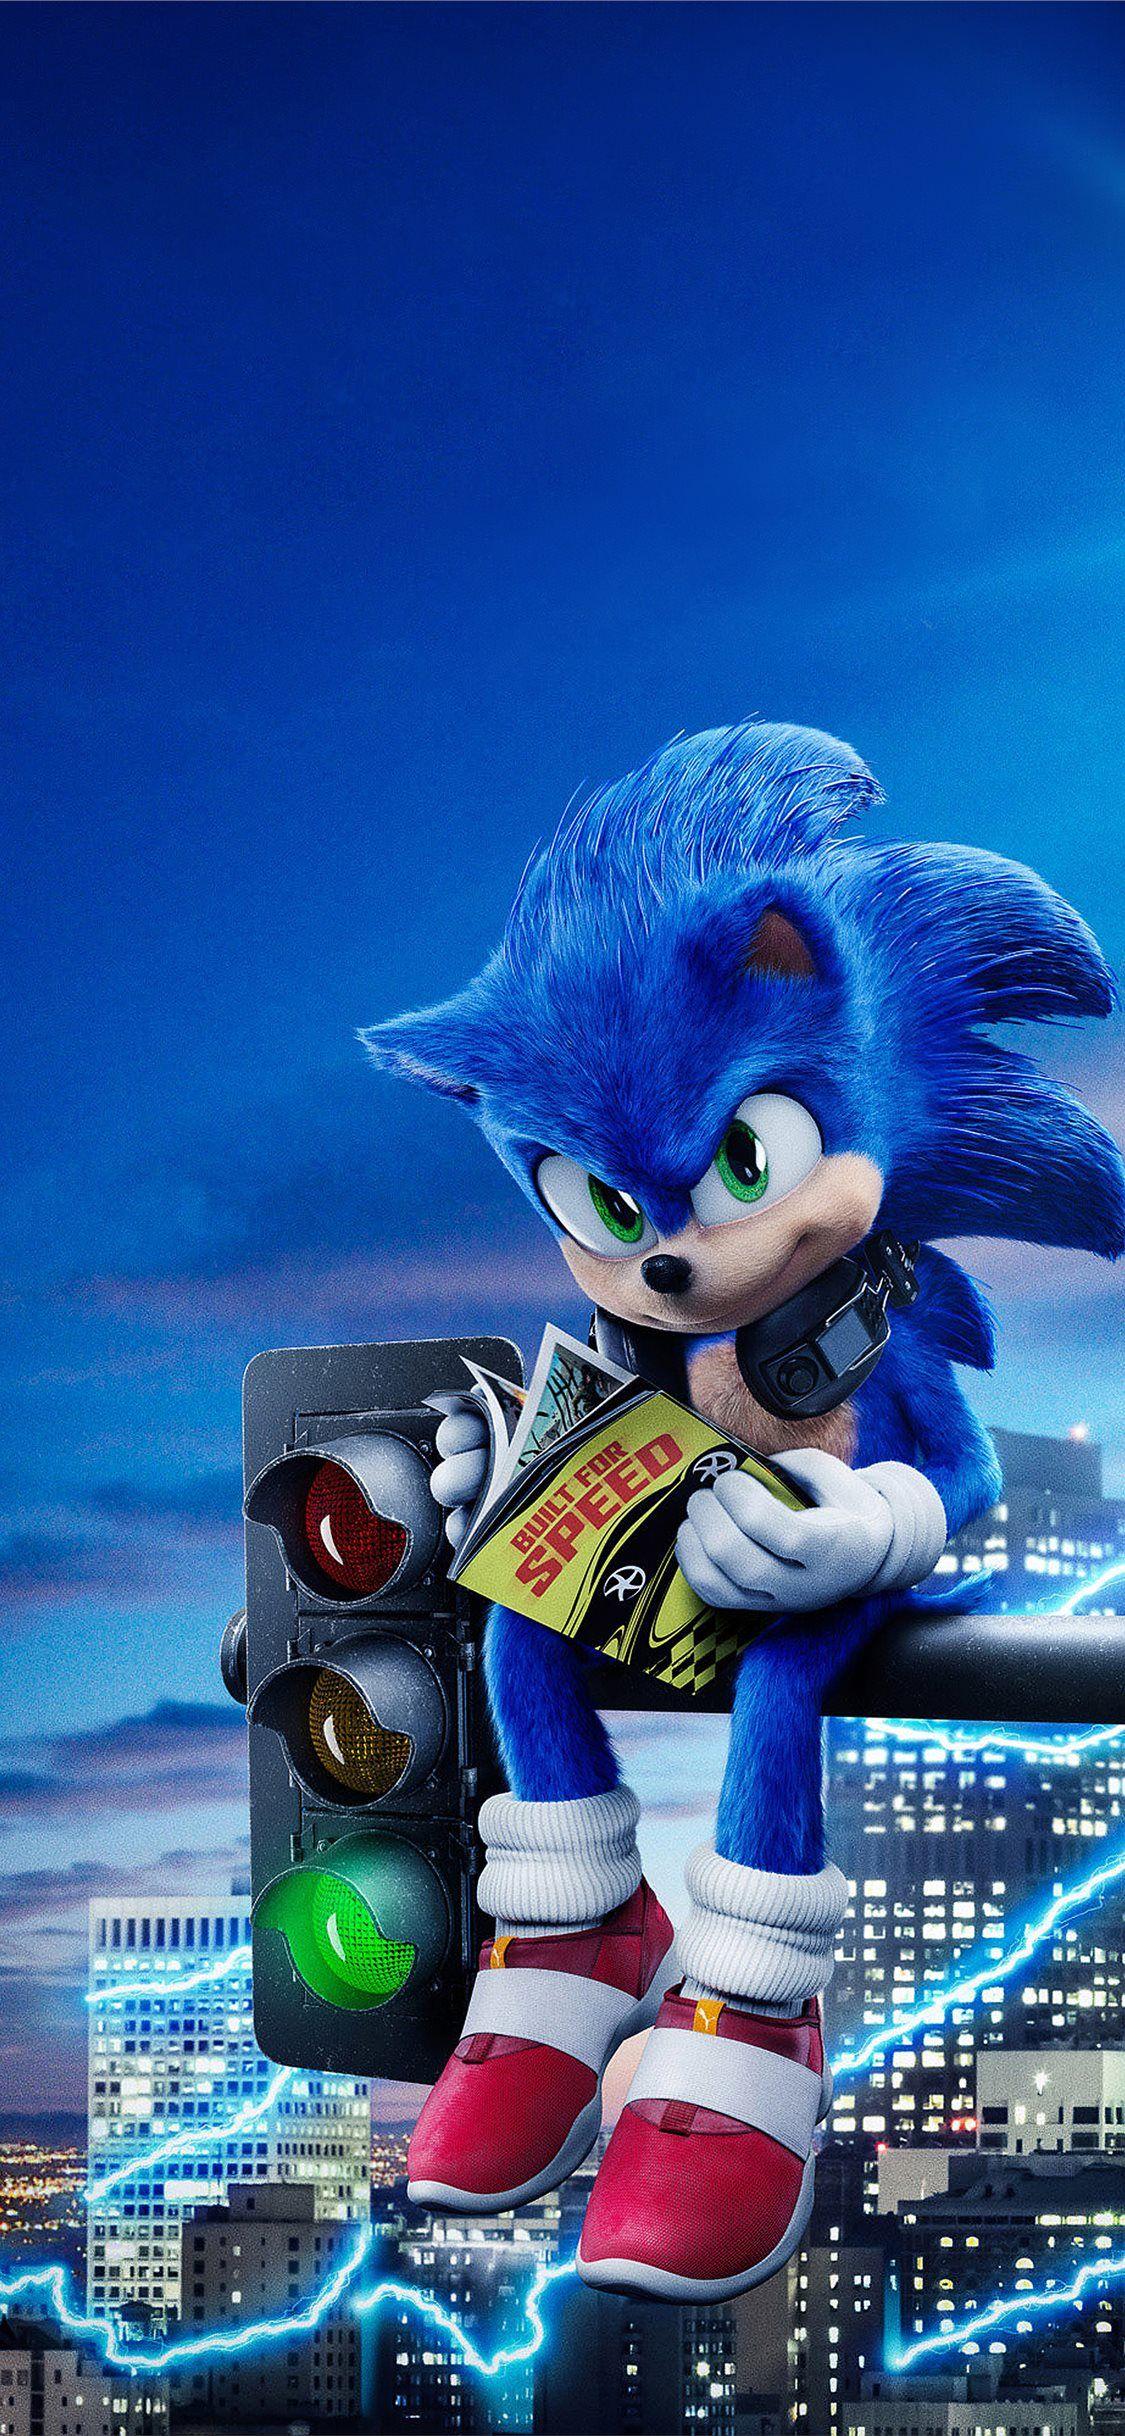 Sonic The Hedgehog Wallpaper Iphone